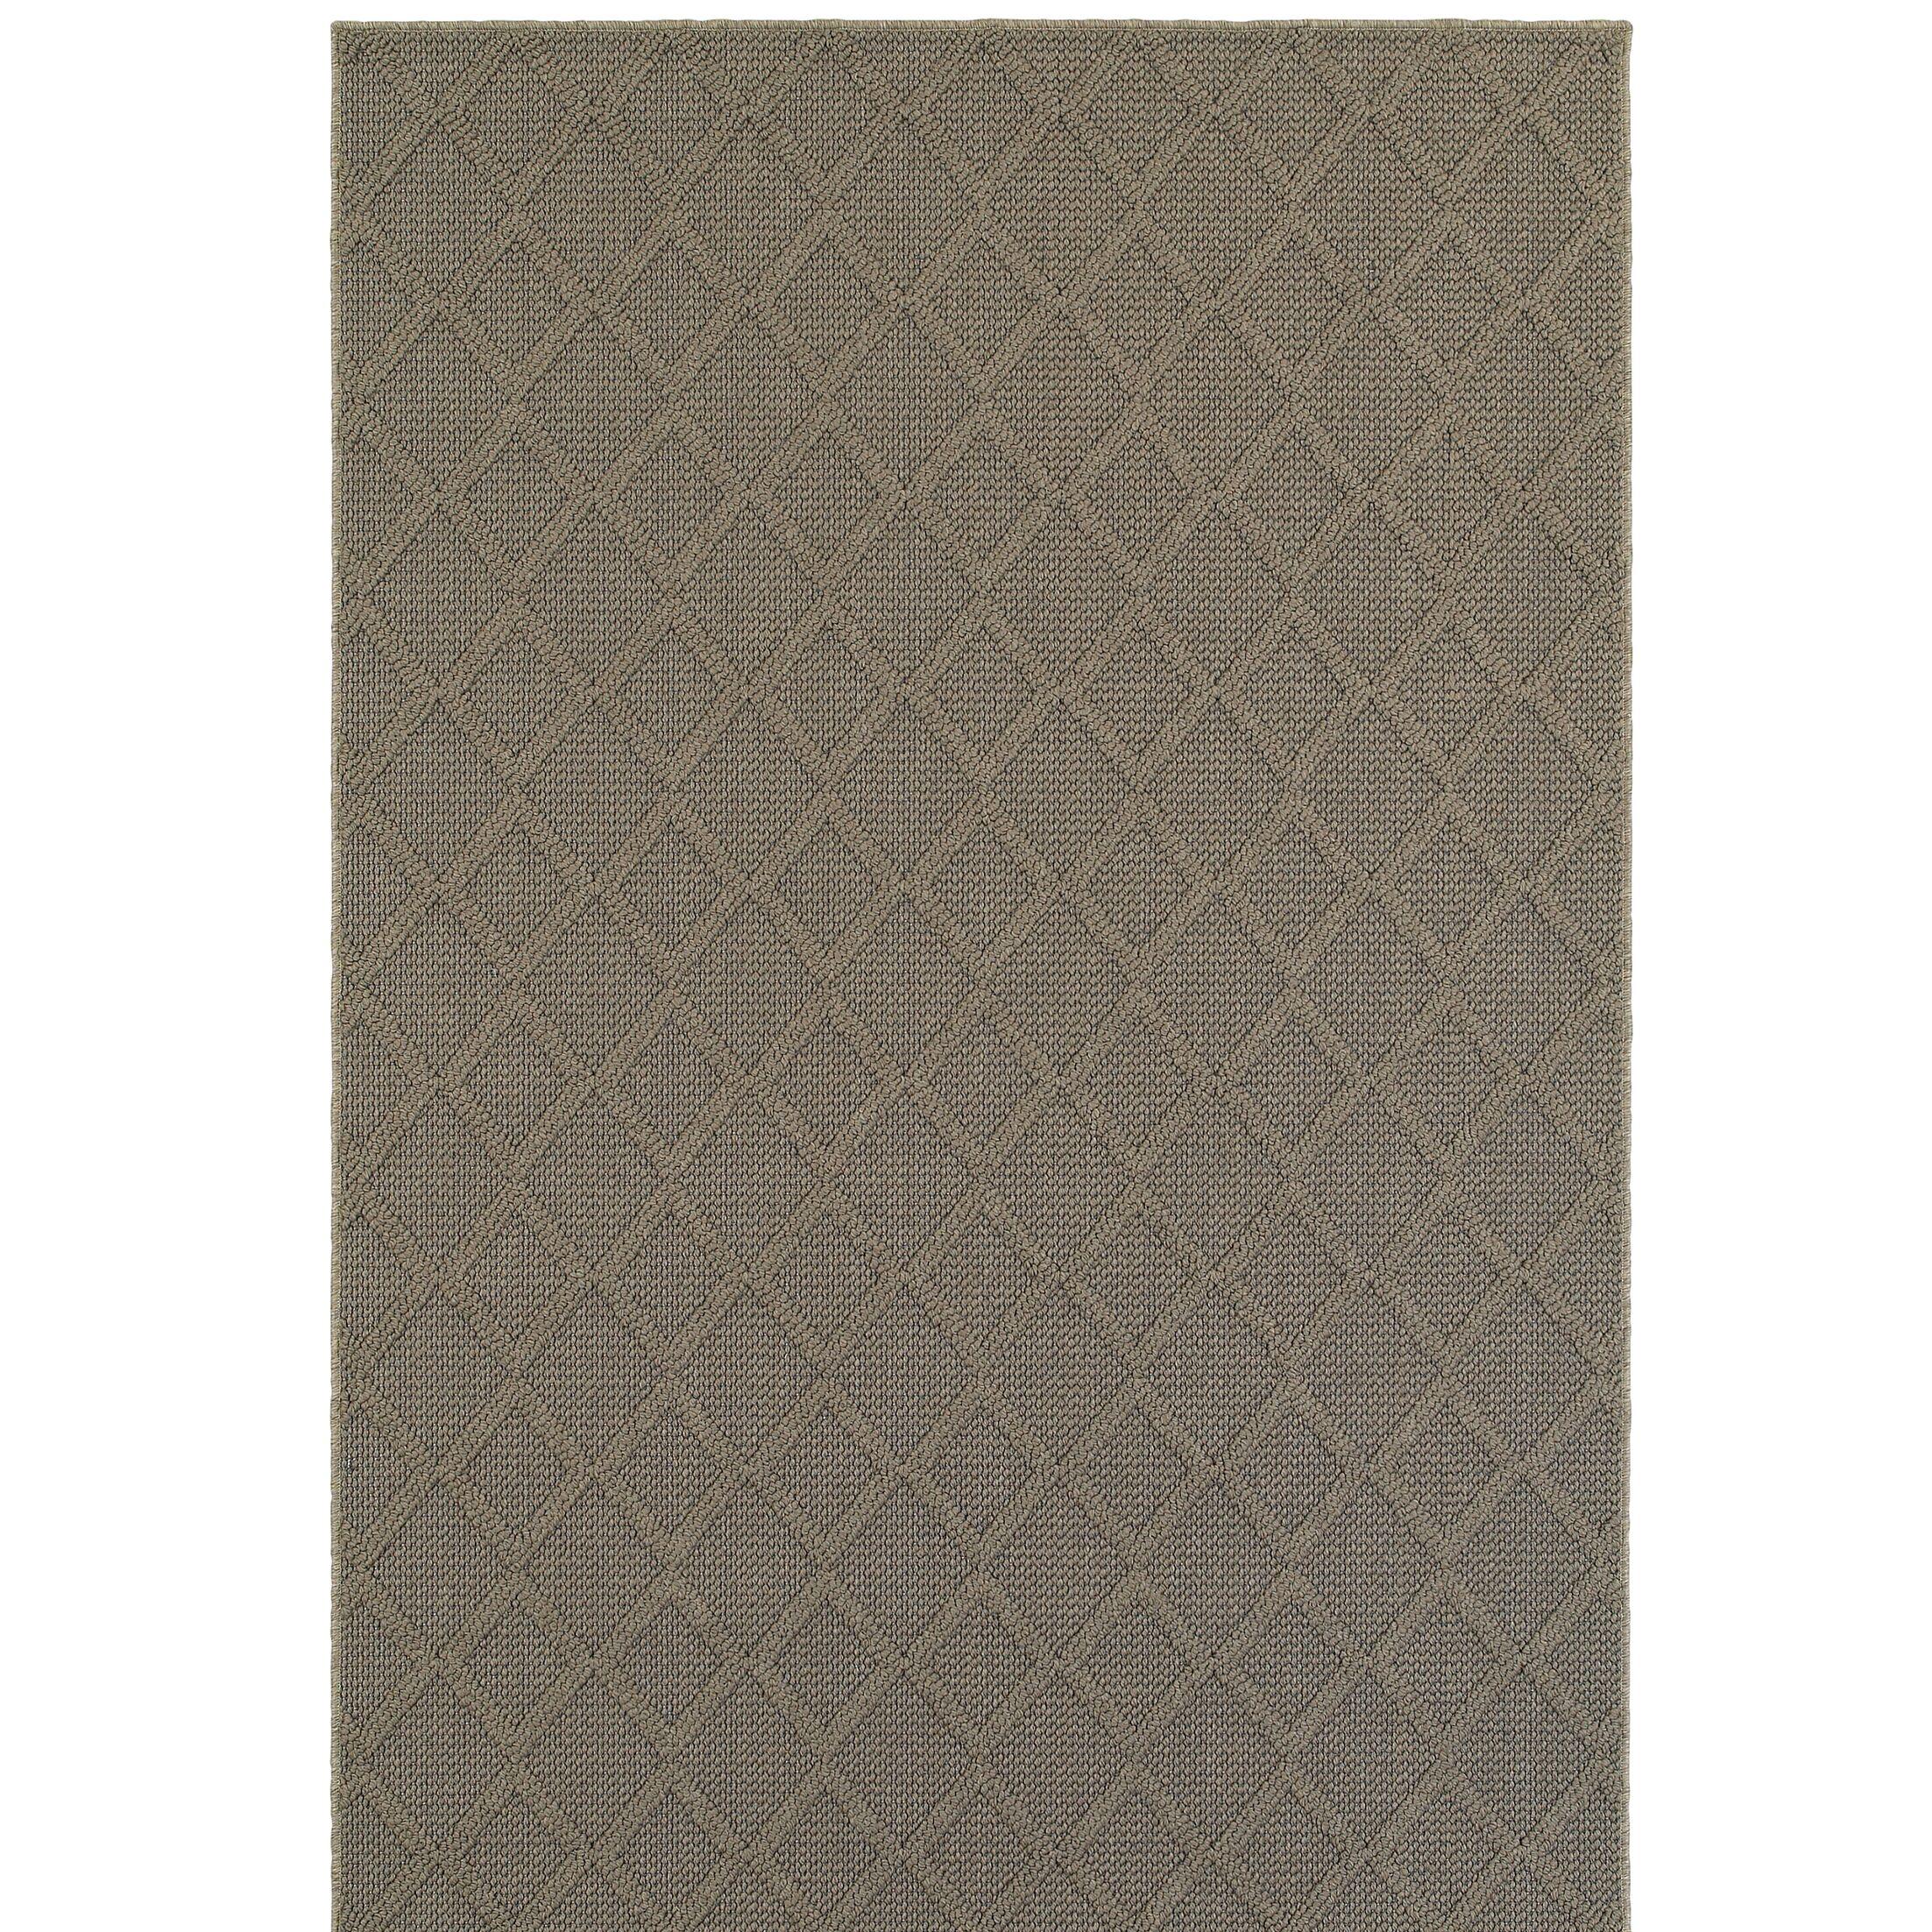 Carrow Gray Indoor/Outdoor Area Rug Rug Size: Rectangle 9'10